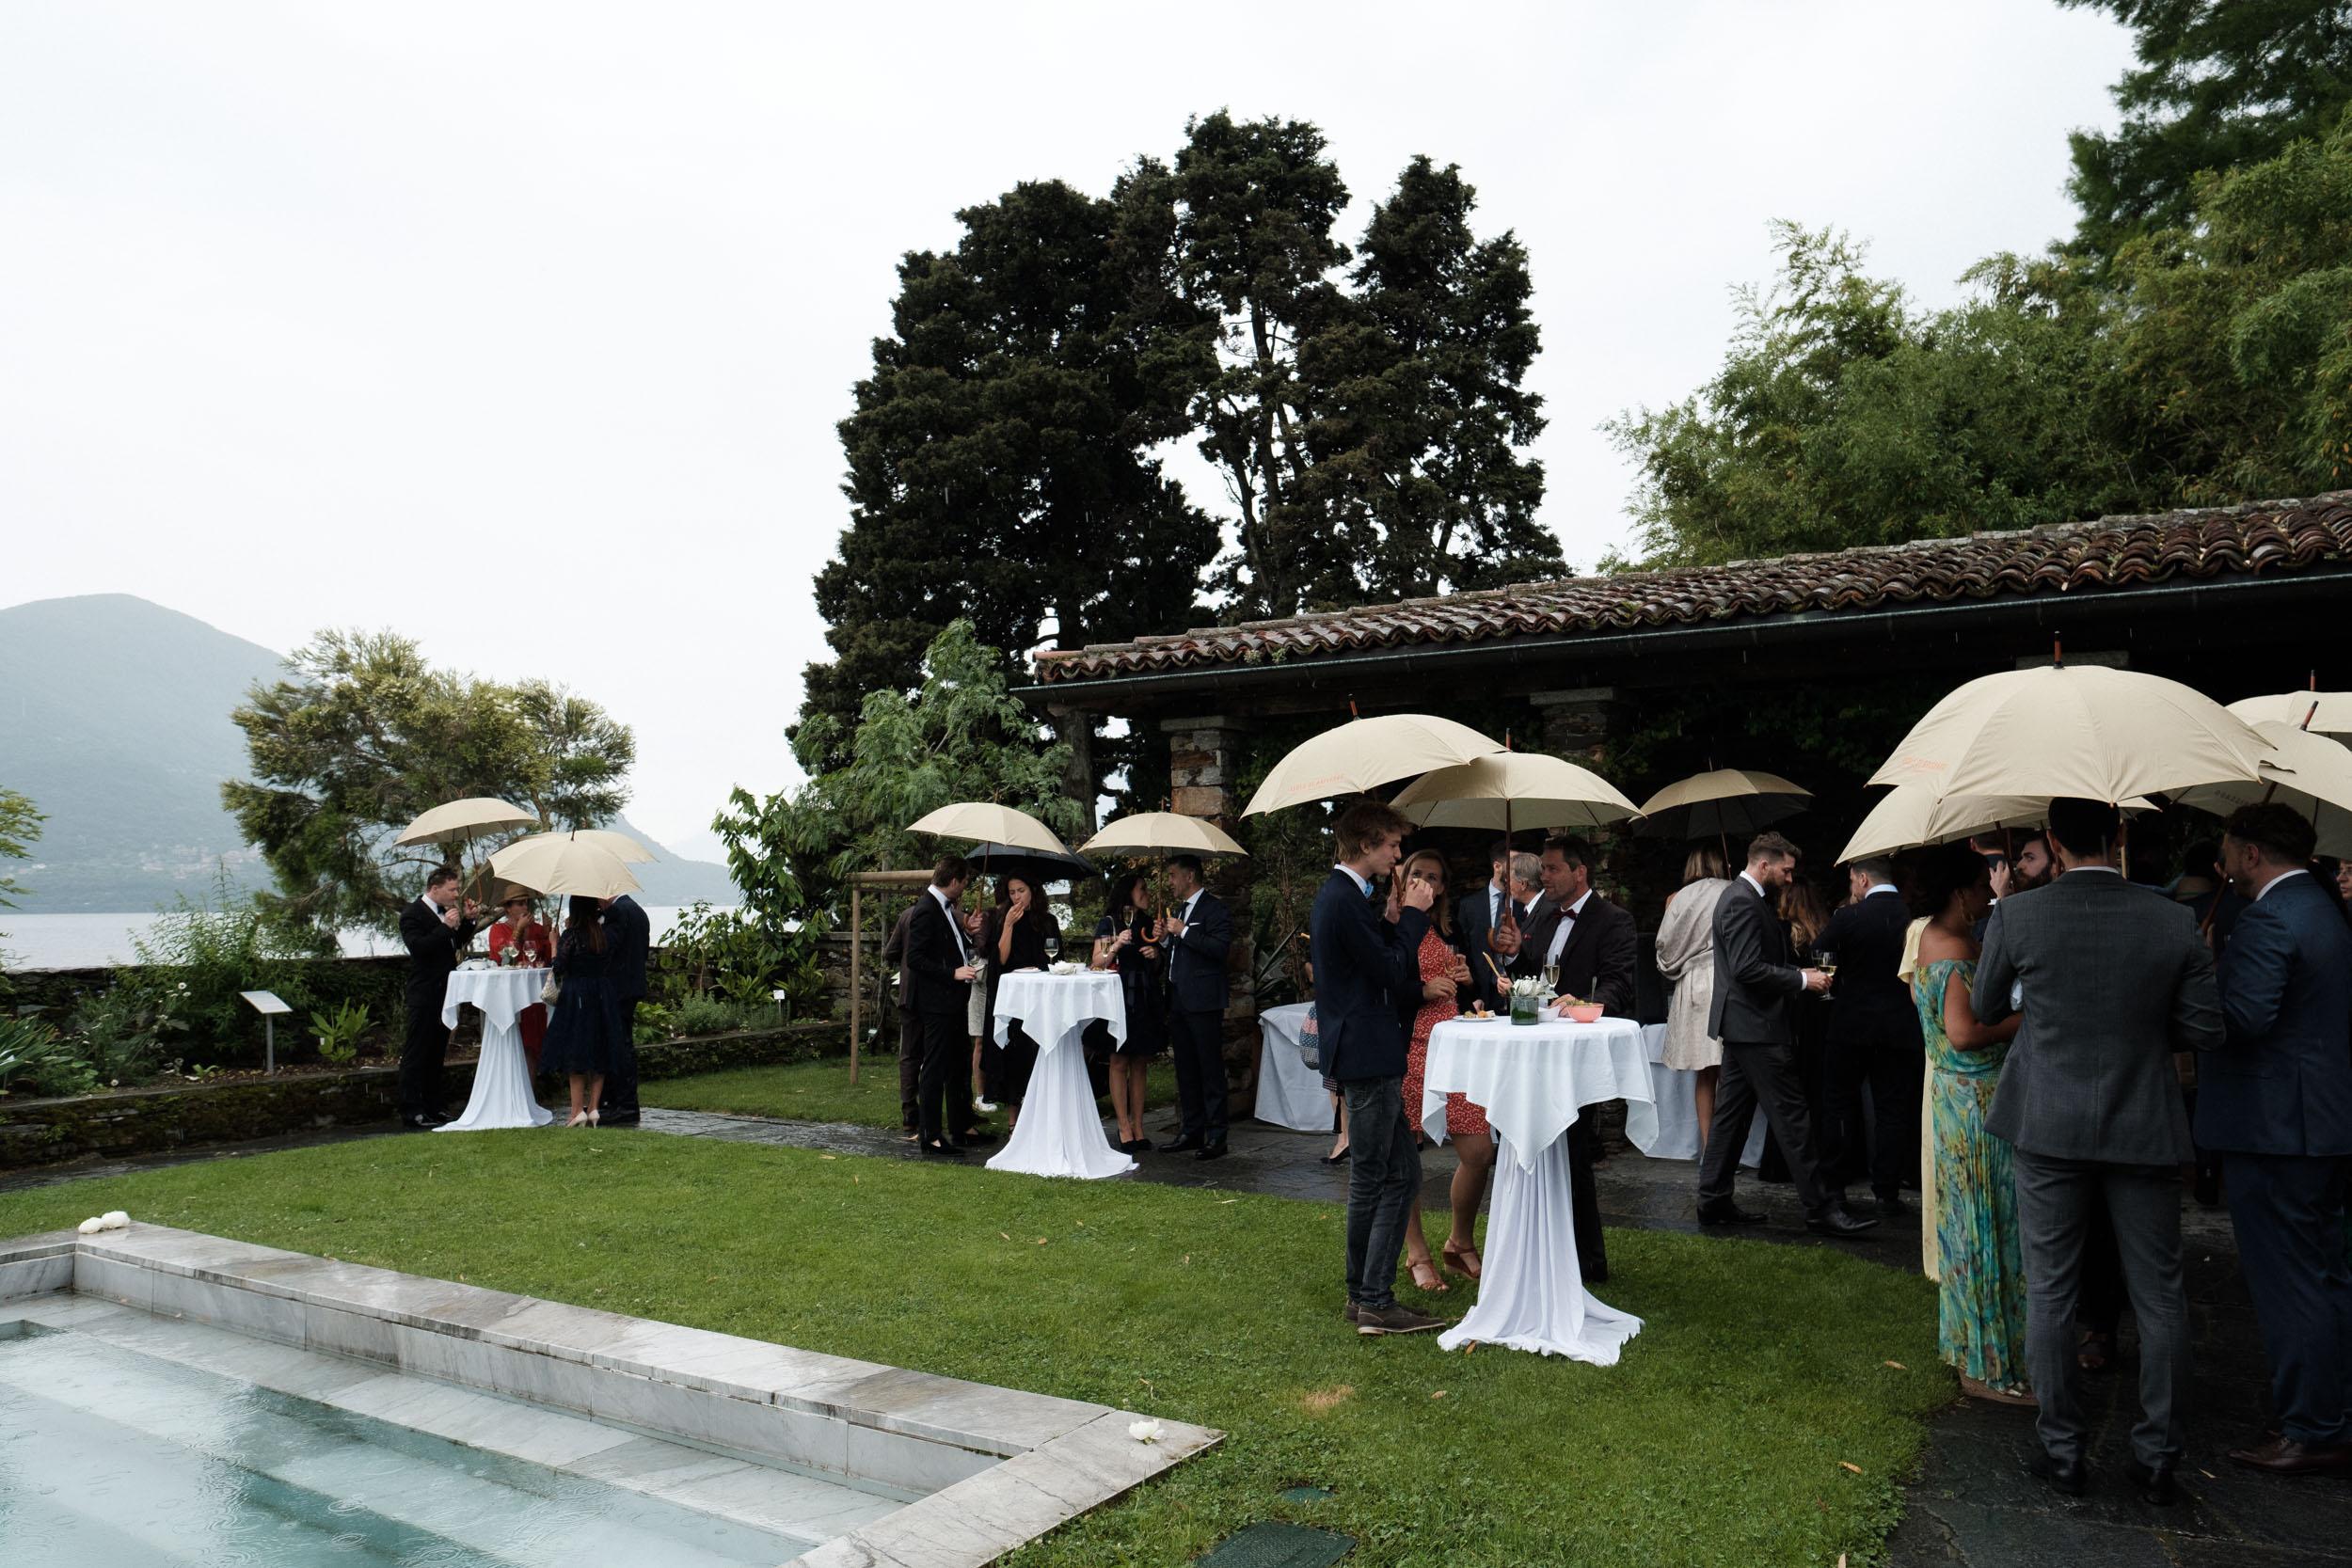 olivia-andreas-wedding-switzerland-218.jpg